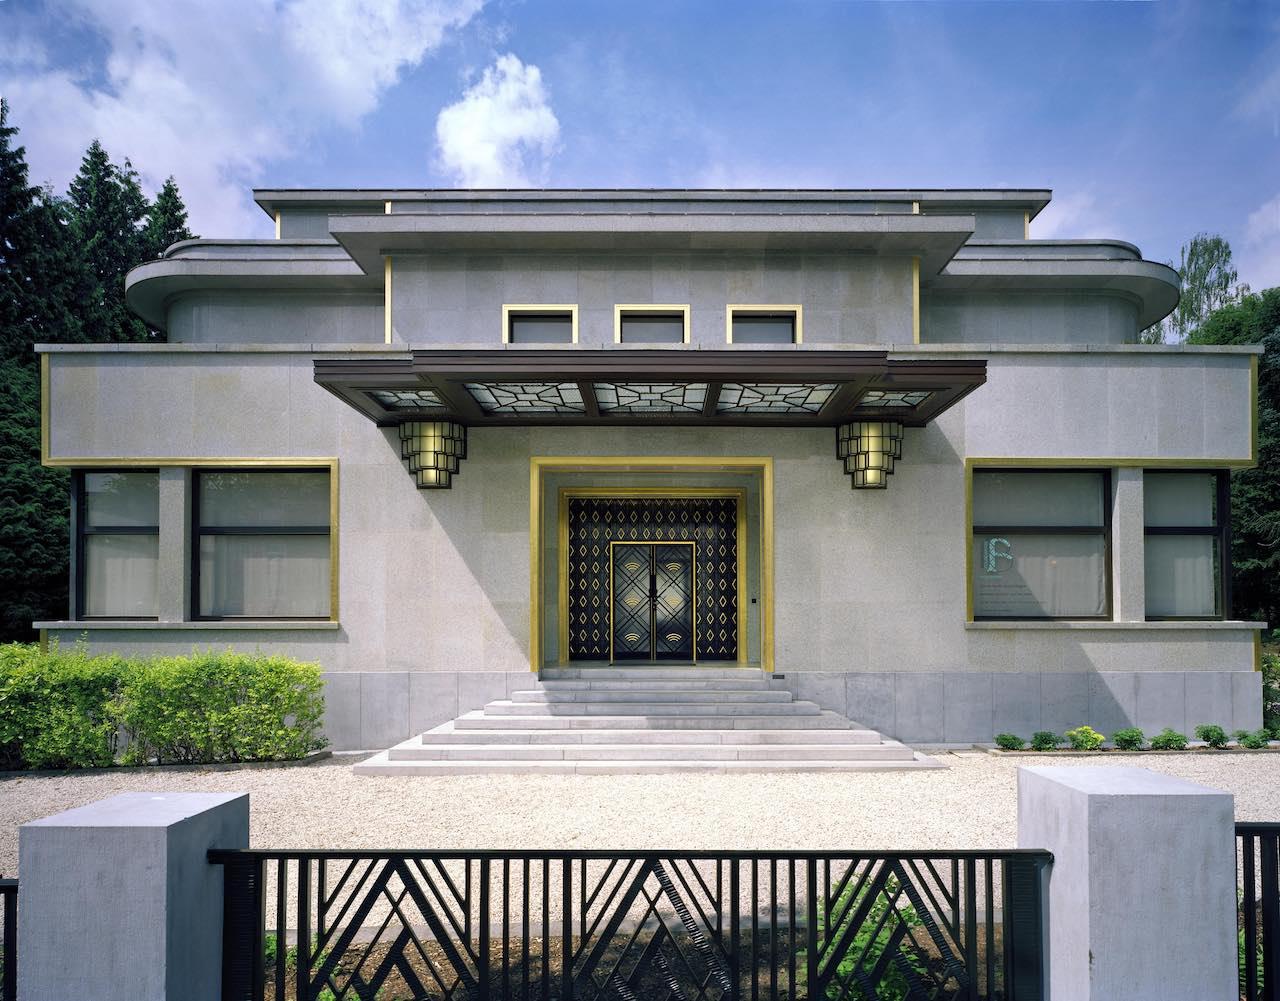 Villa Empain Fondation Boghossian